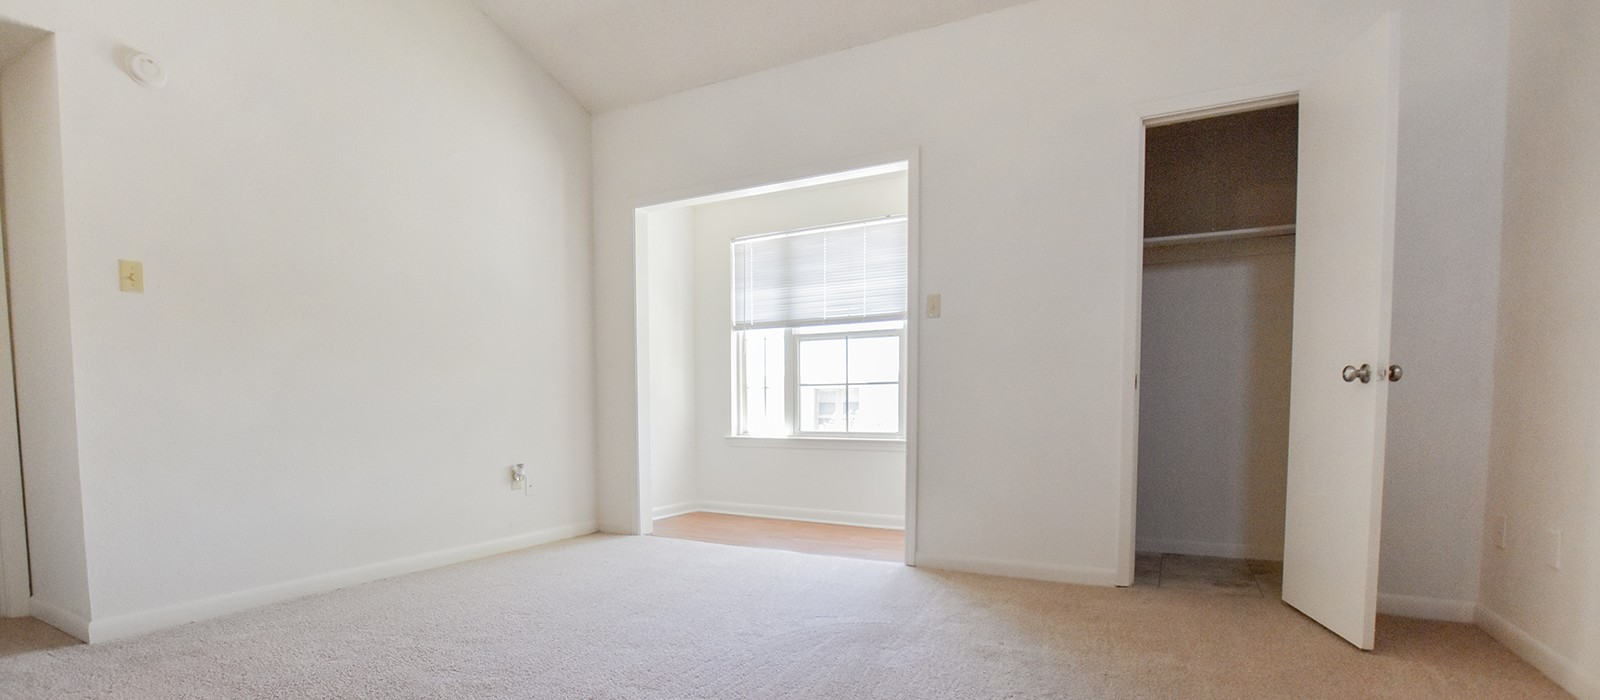 La Apartments 2 Bedroom Home Design Plan